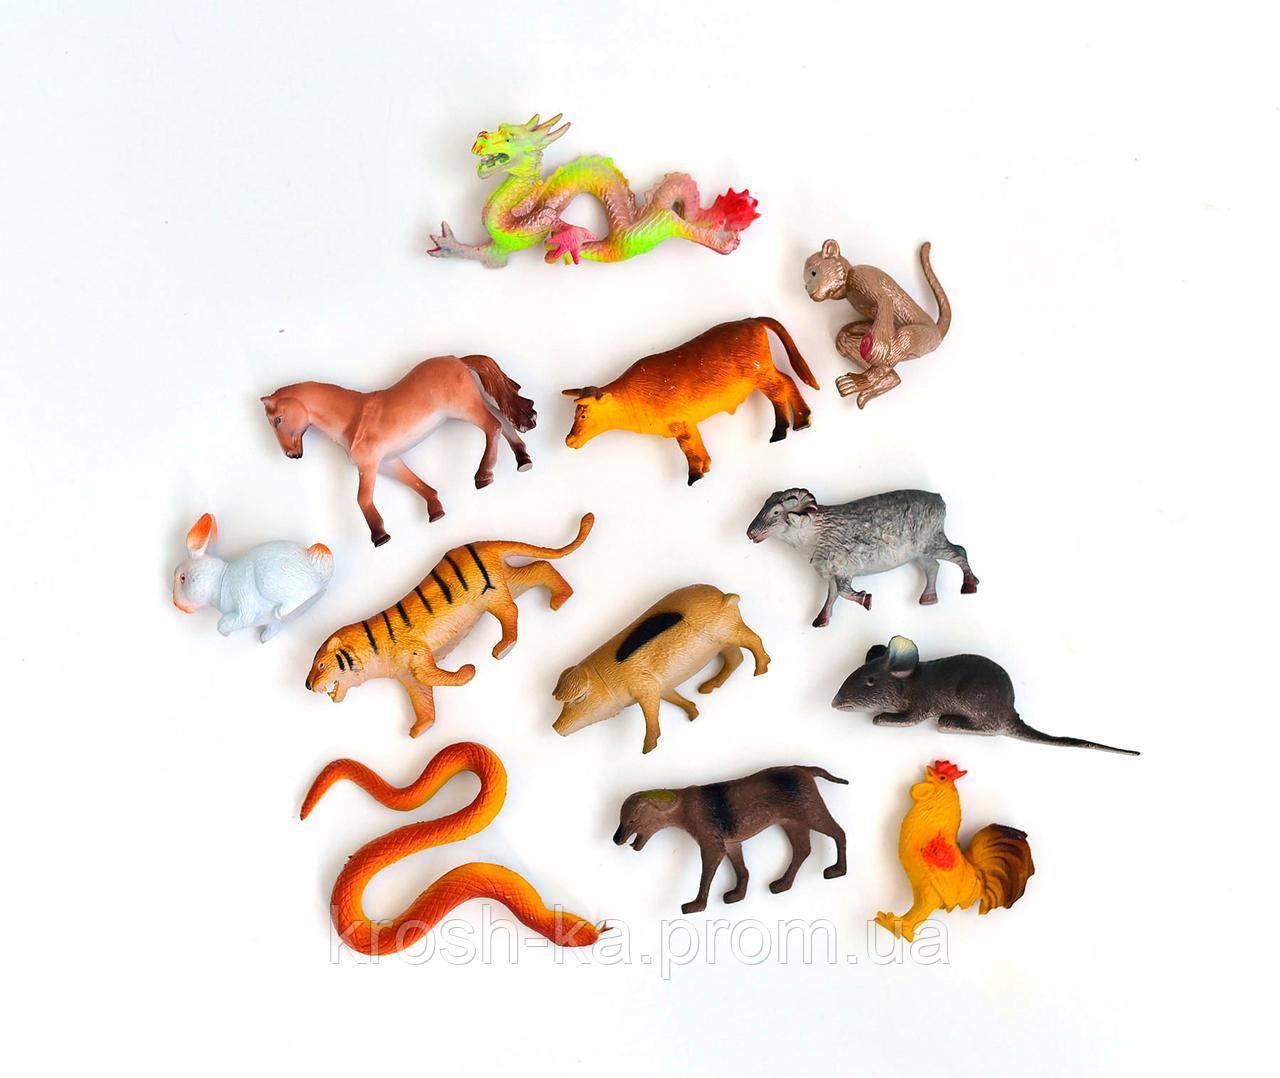 Фигуры животных Farm set набор 12шт Китай H642